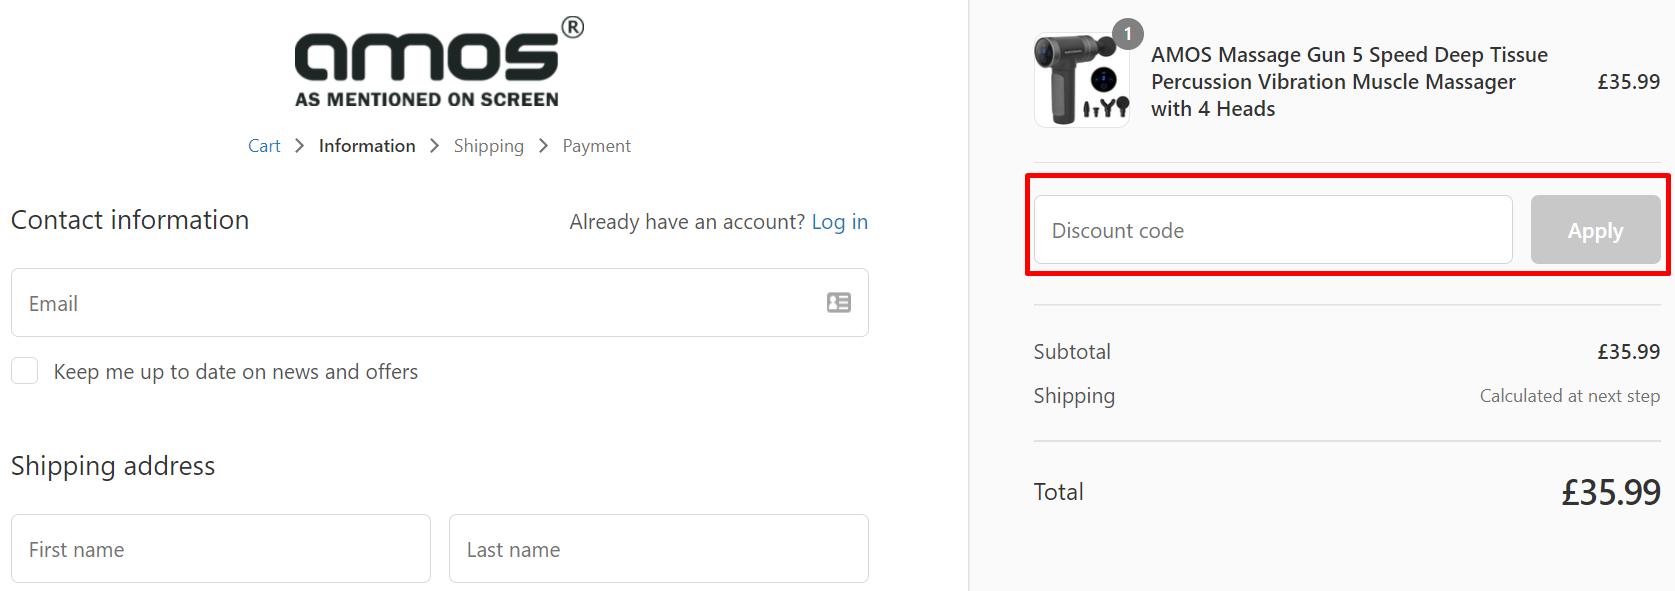 How do I use my AMOS discount code?